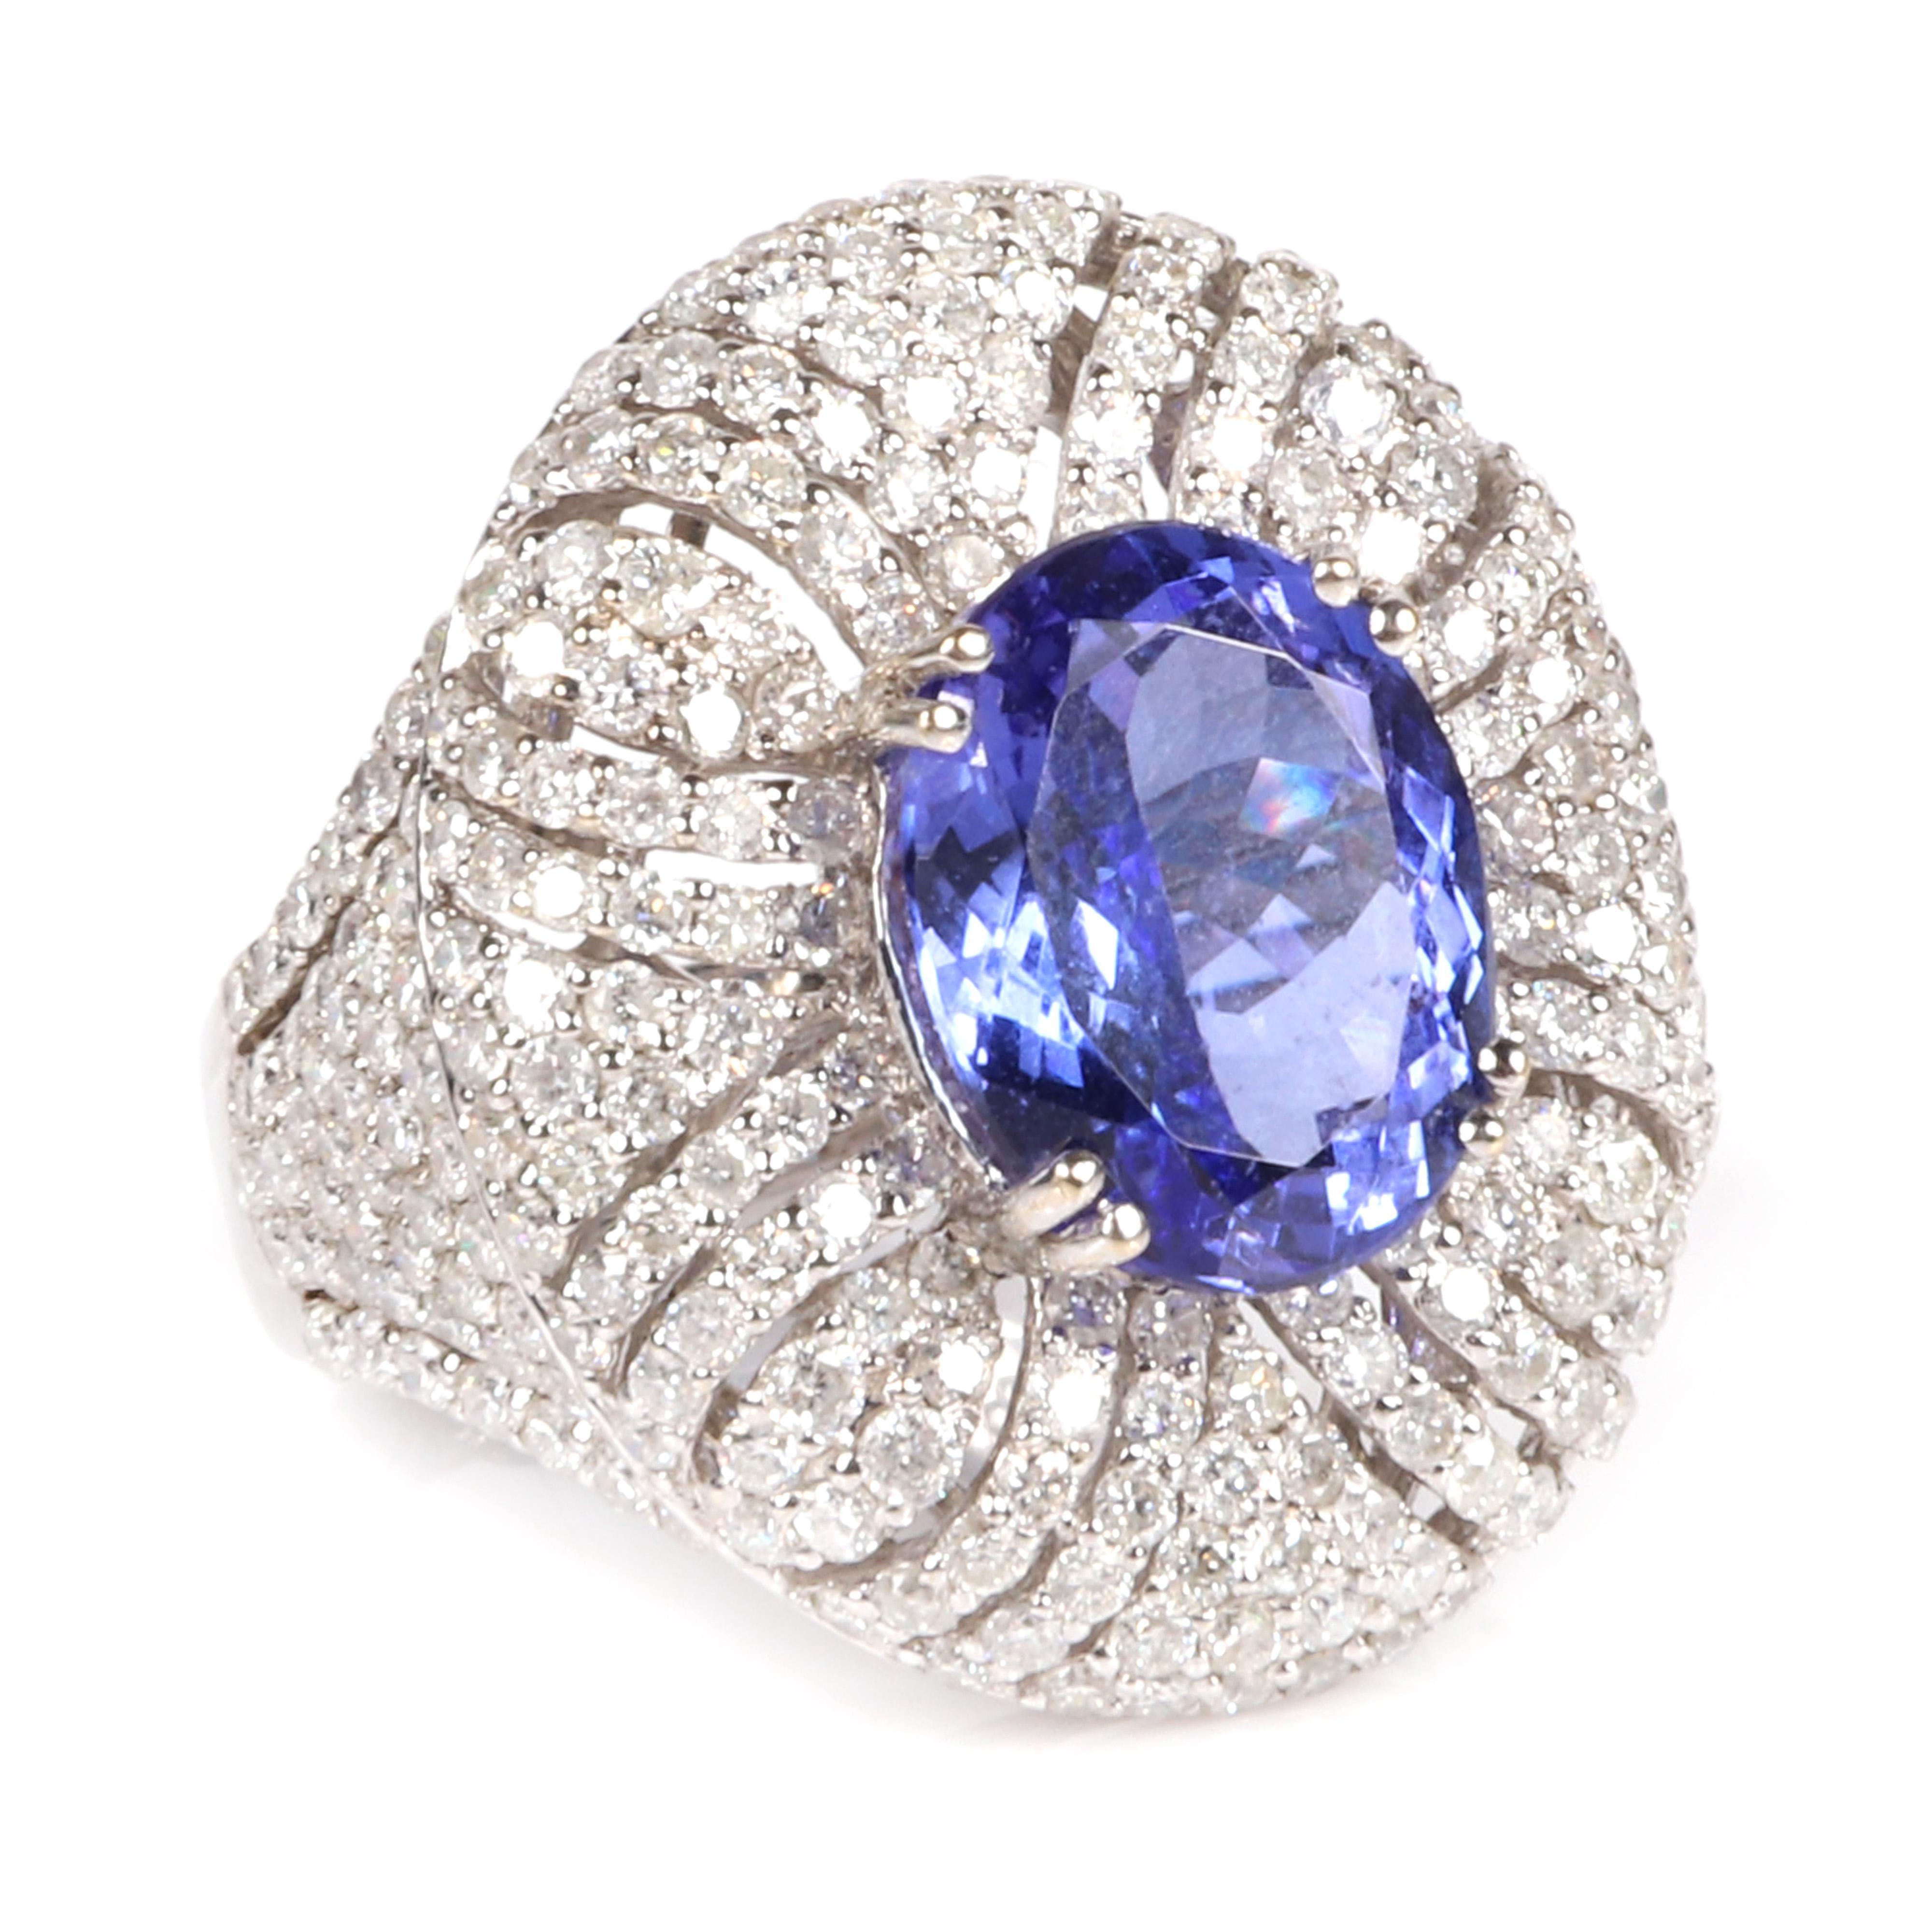 Ladies 18K stamped white gold Tanzanite and diamond ring featuring: Ring size 6 1/2